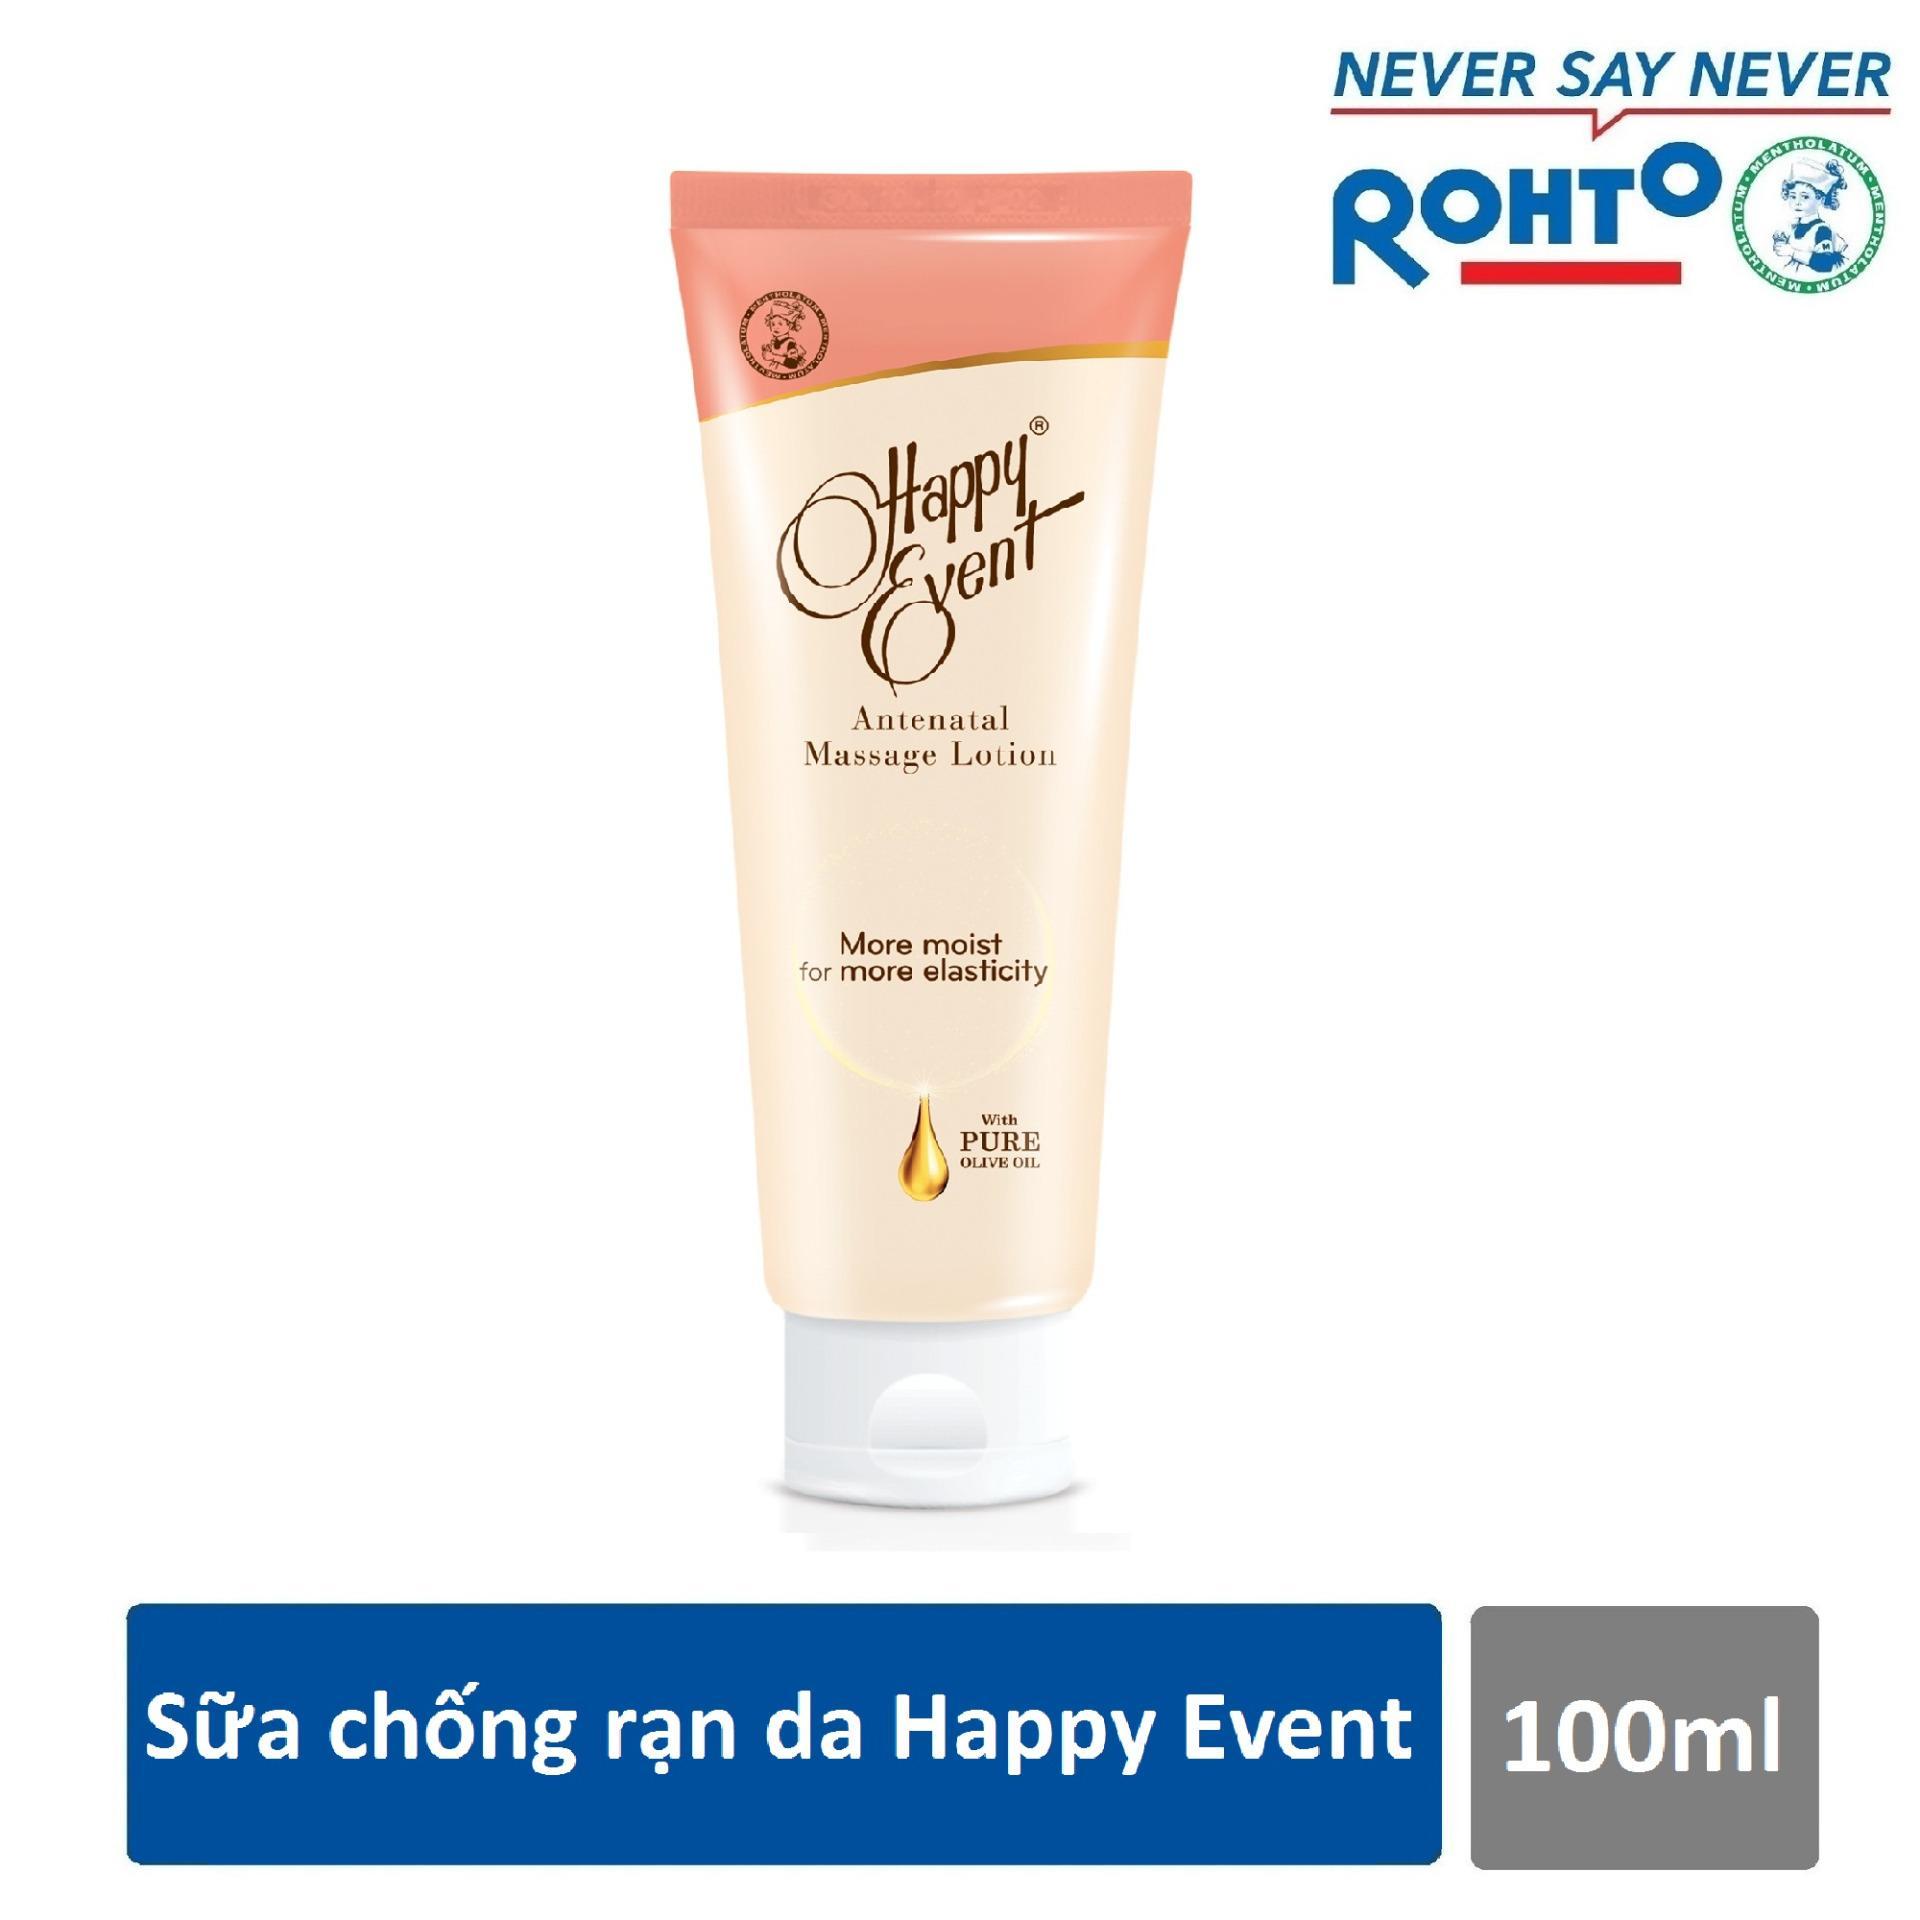 Sữa chống rạn da Happy Event 100ml